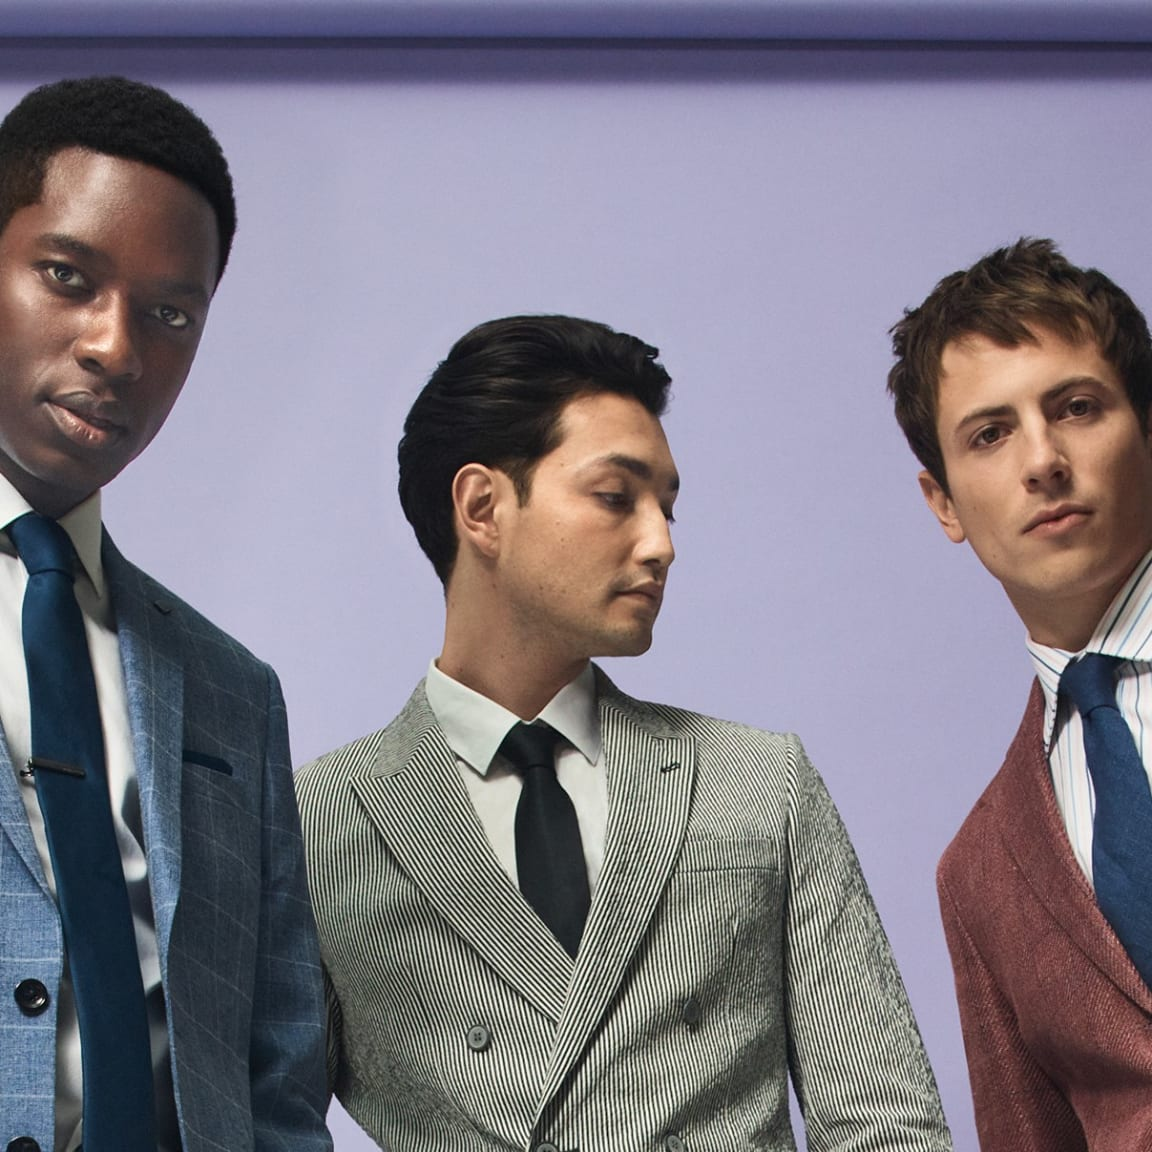 David Jones: Four ways to freshen up your suiting